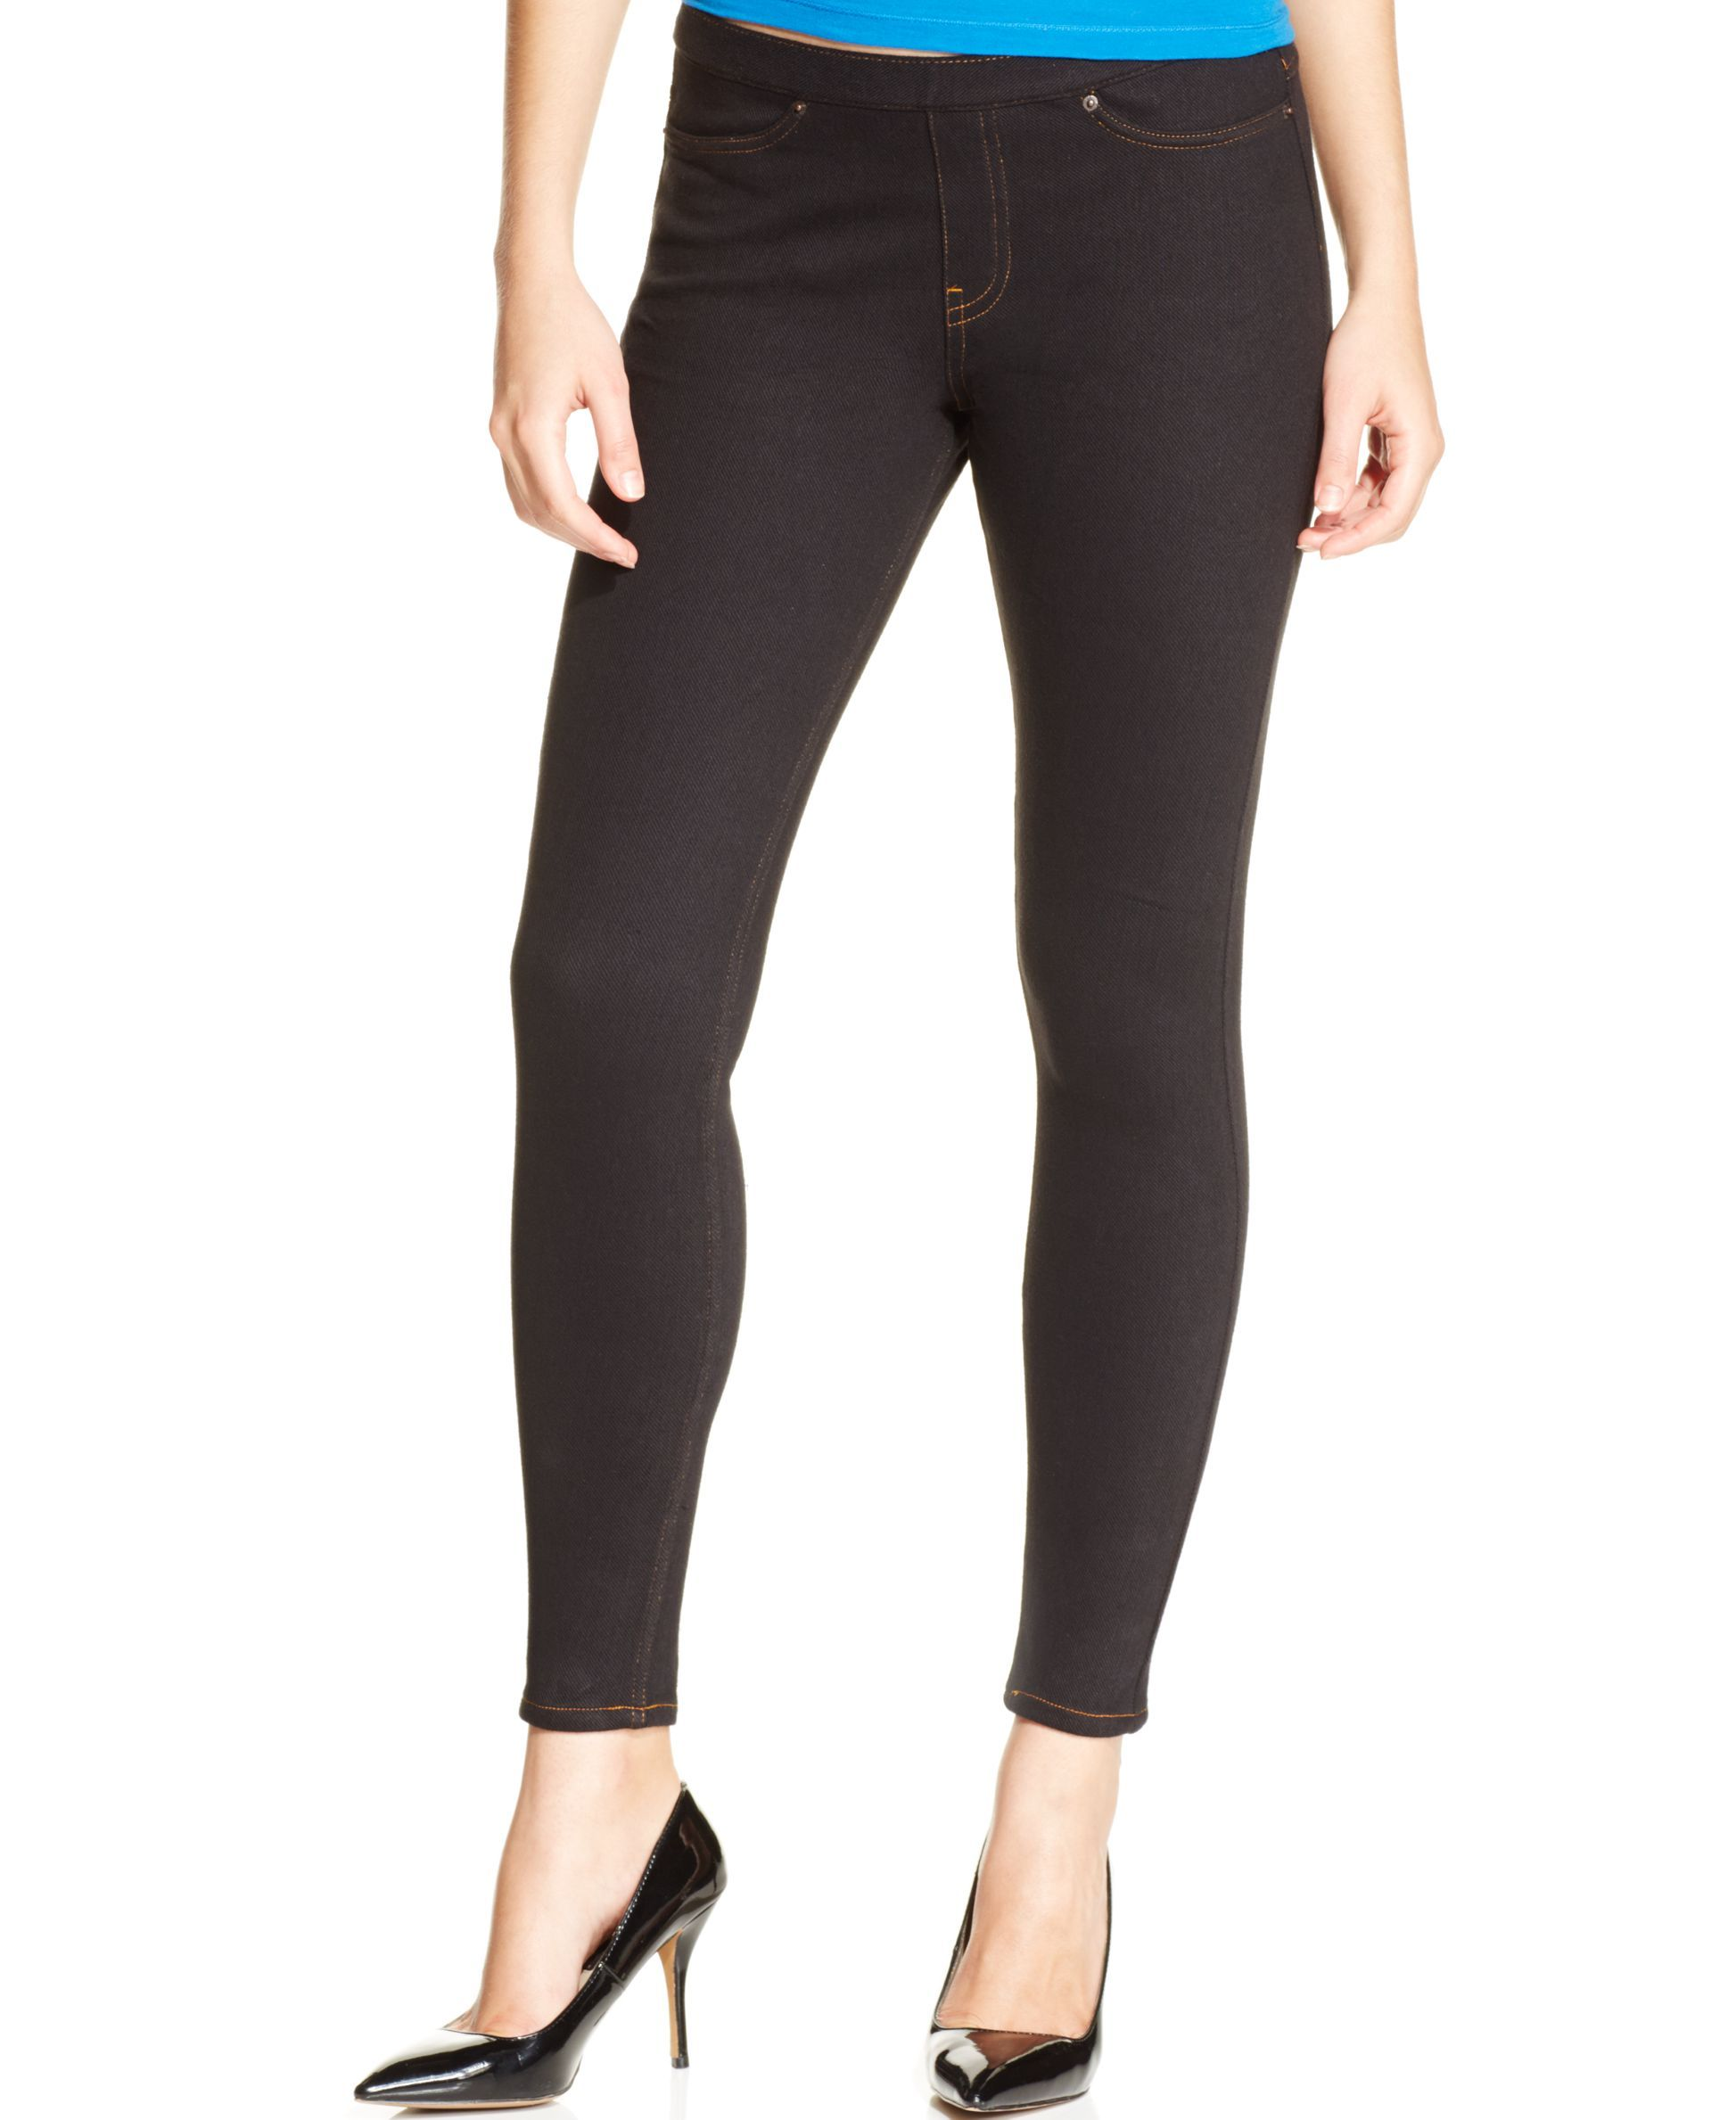 HUE Women/'s Essential Denim Jean Capri Leggings A Choose SZ//color